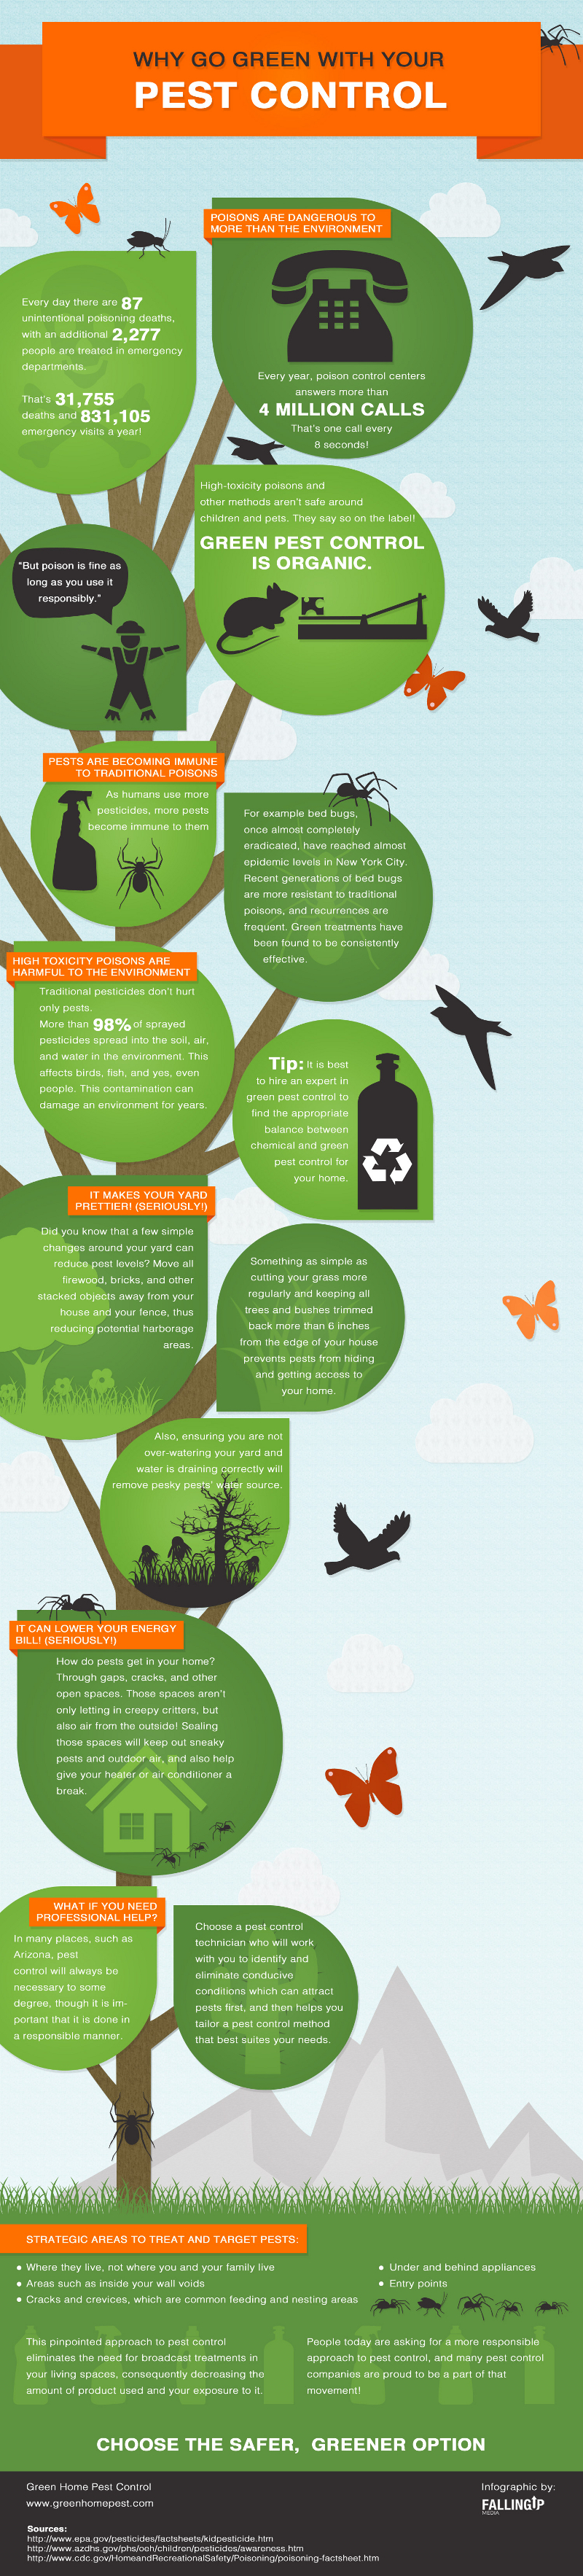 Environmentally Friendly Pest Control